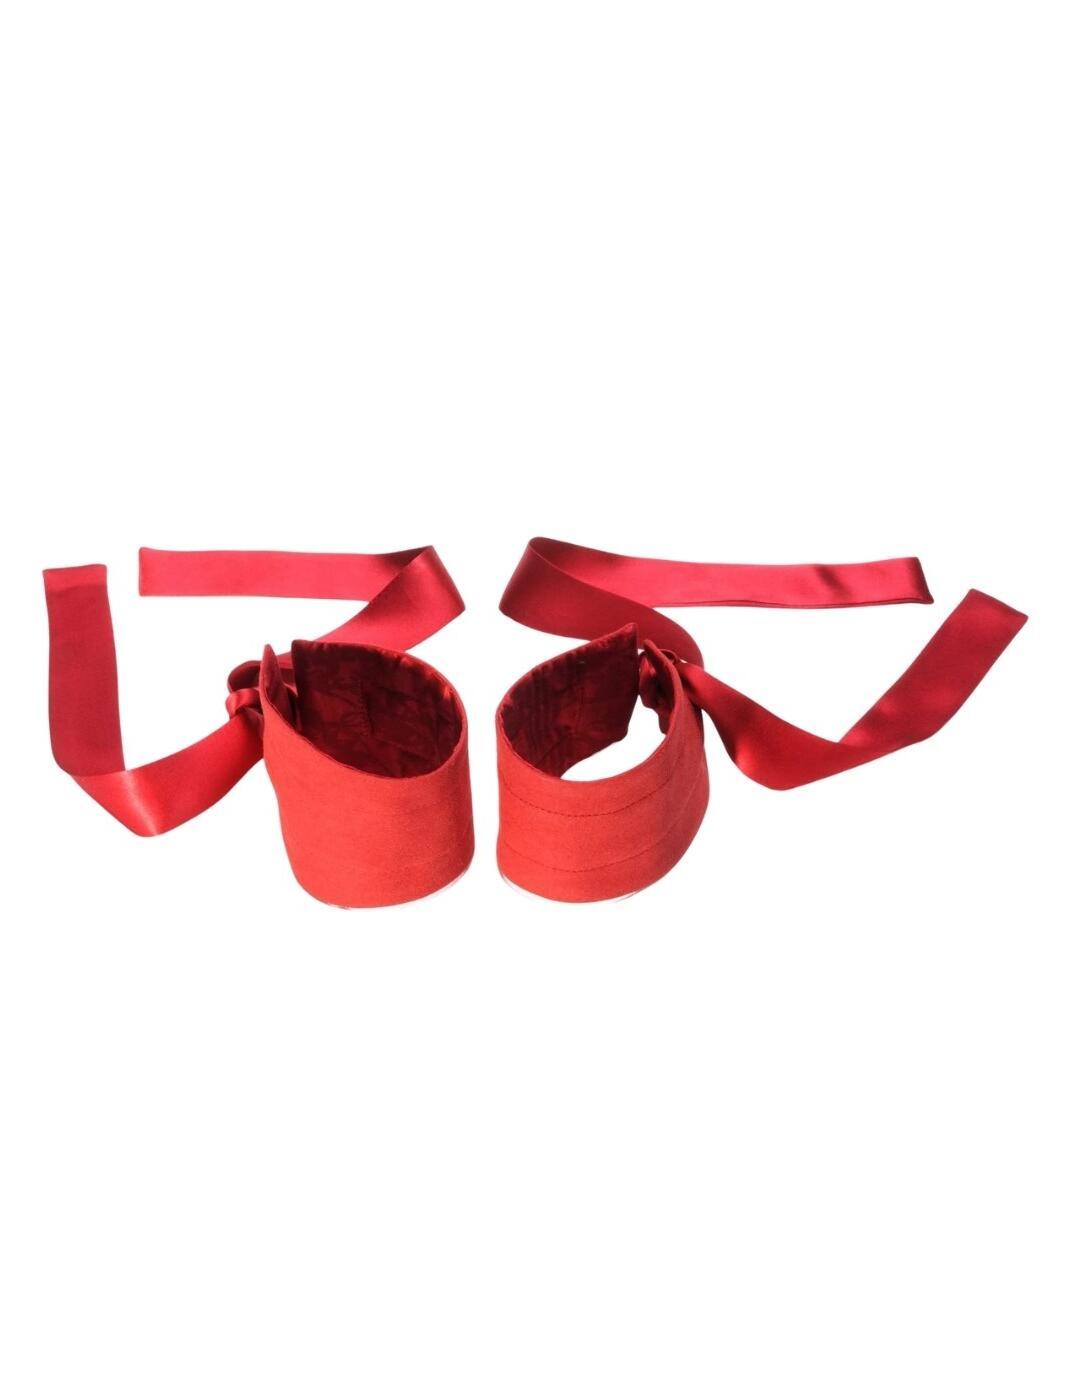 E21962 Lelo Etherea Silk Cuffs - E21962 Red